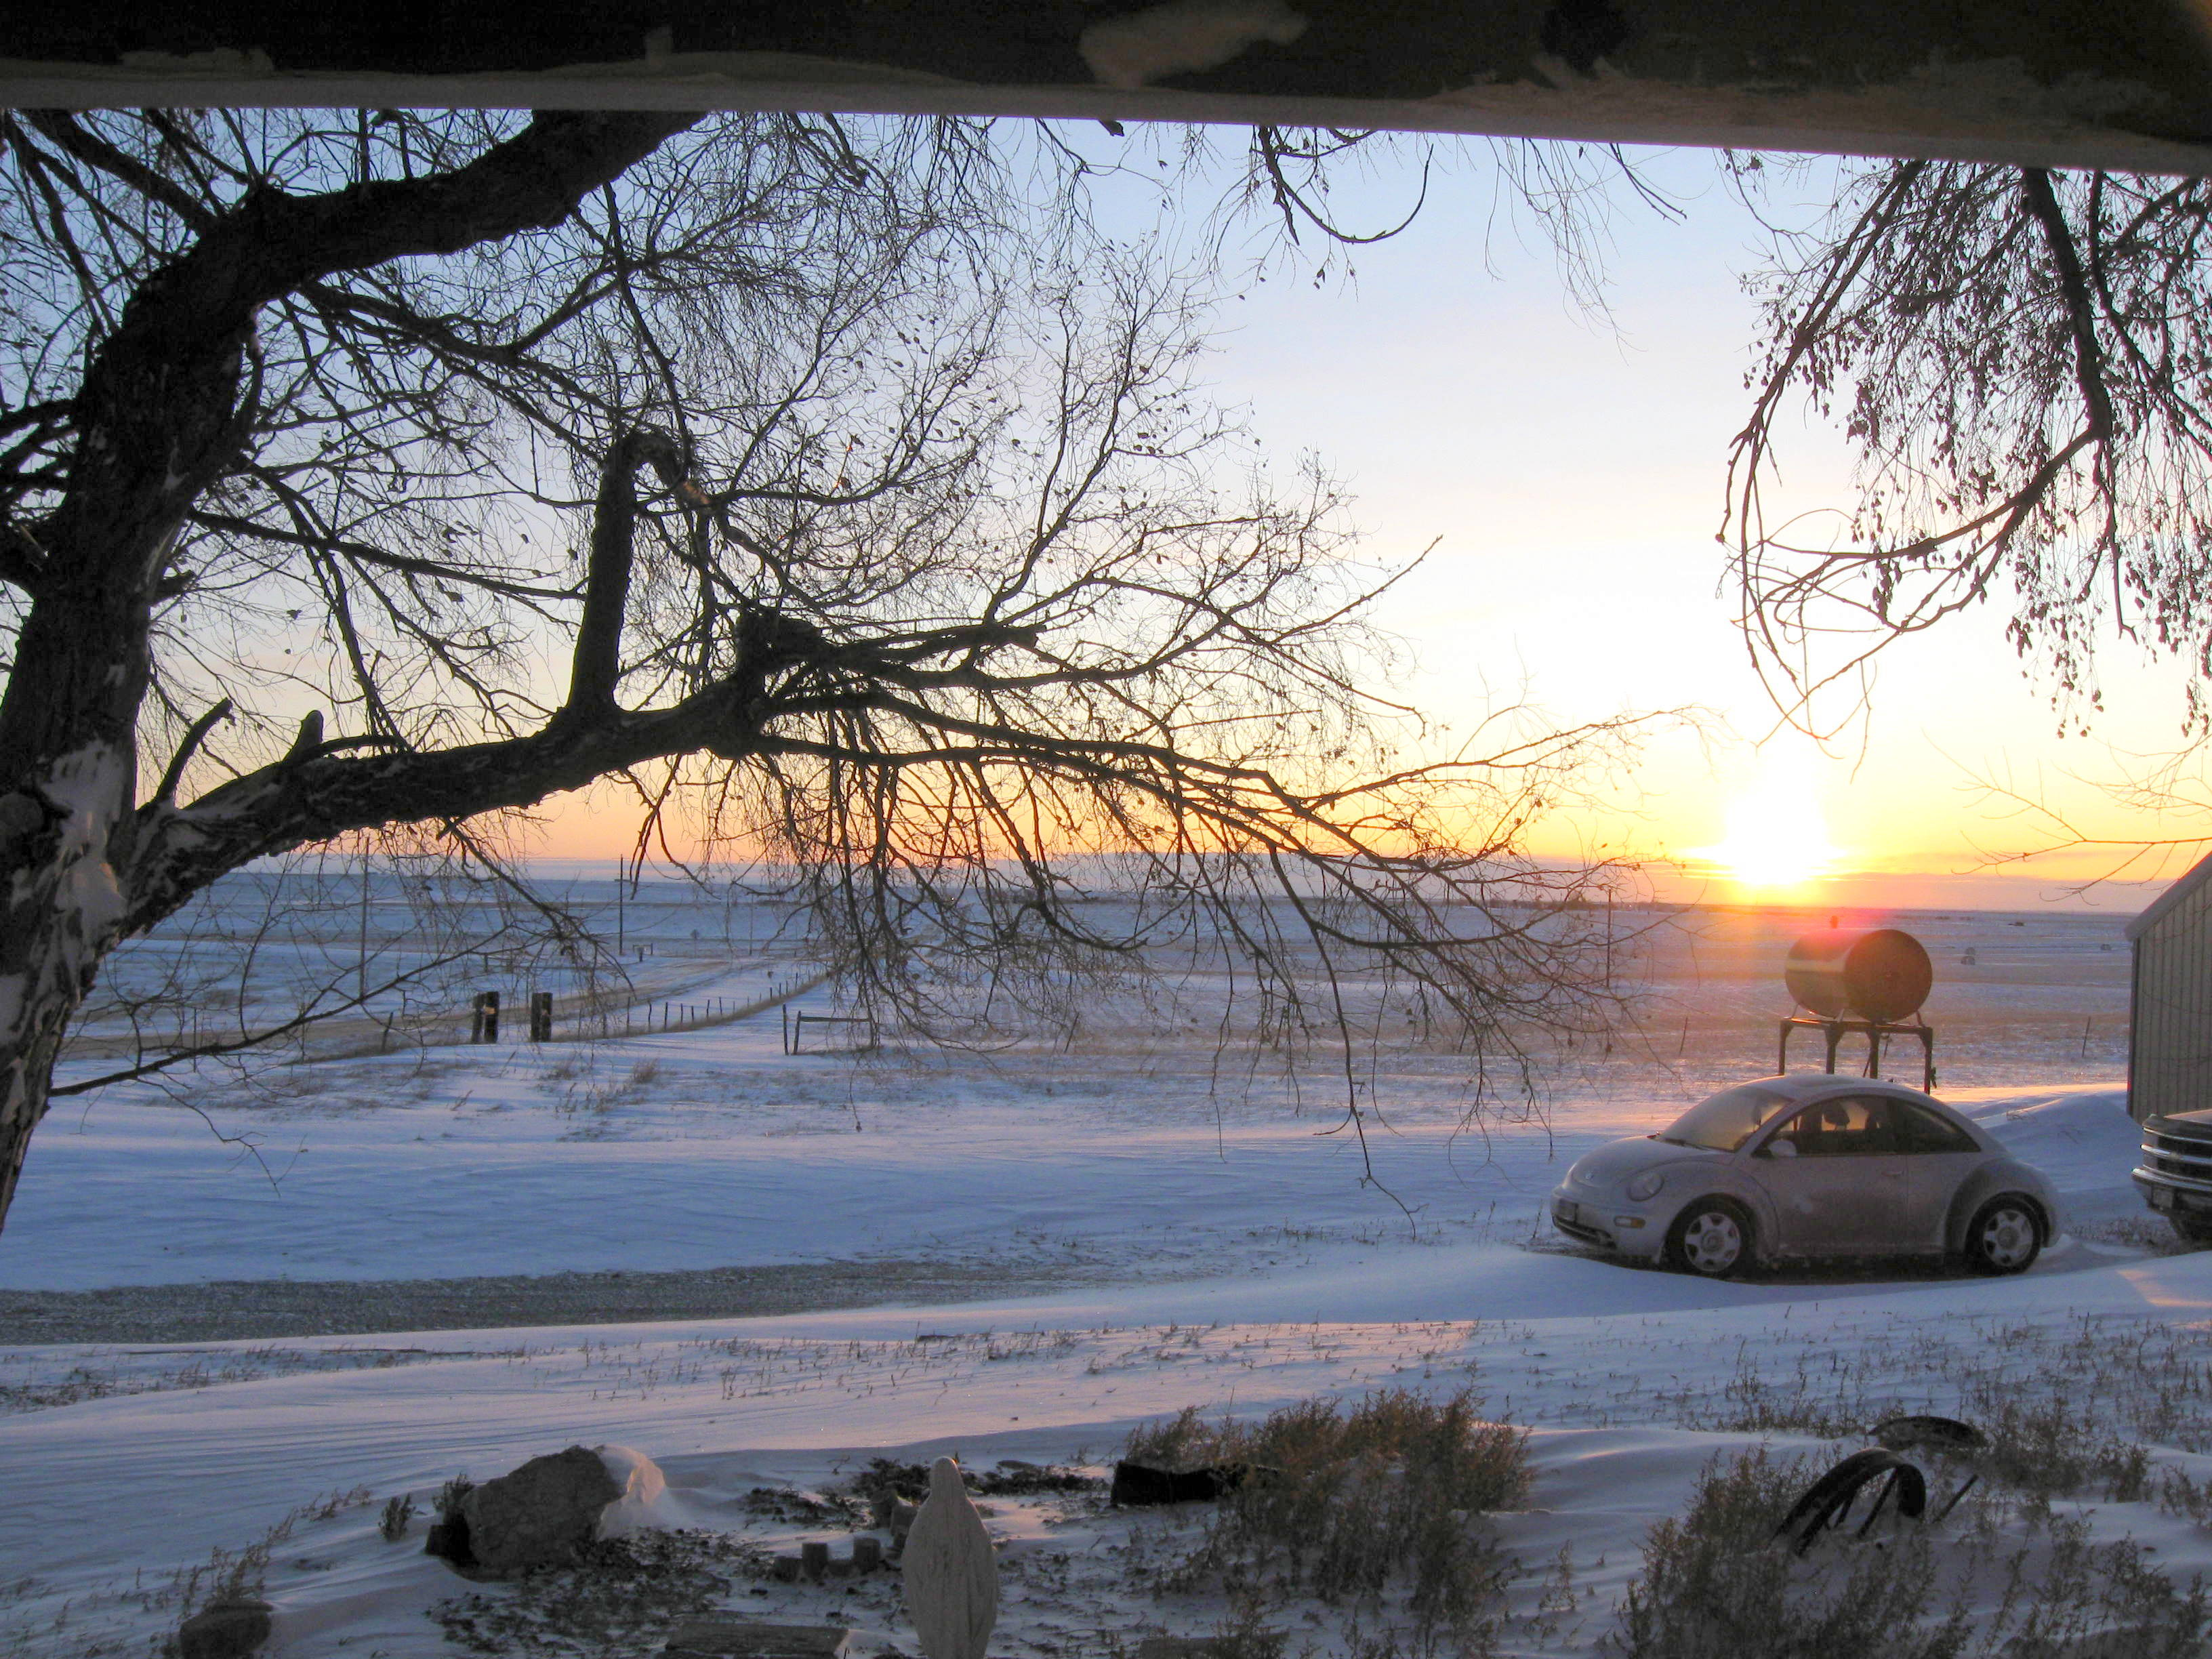 Looking toward the sunrise